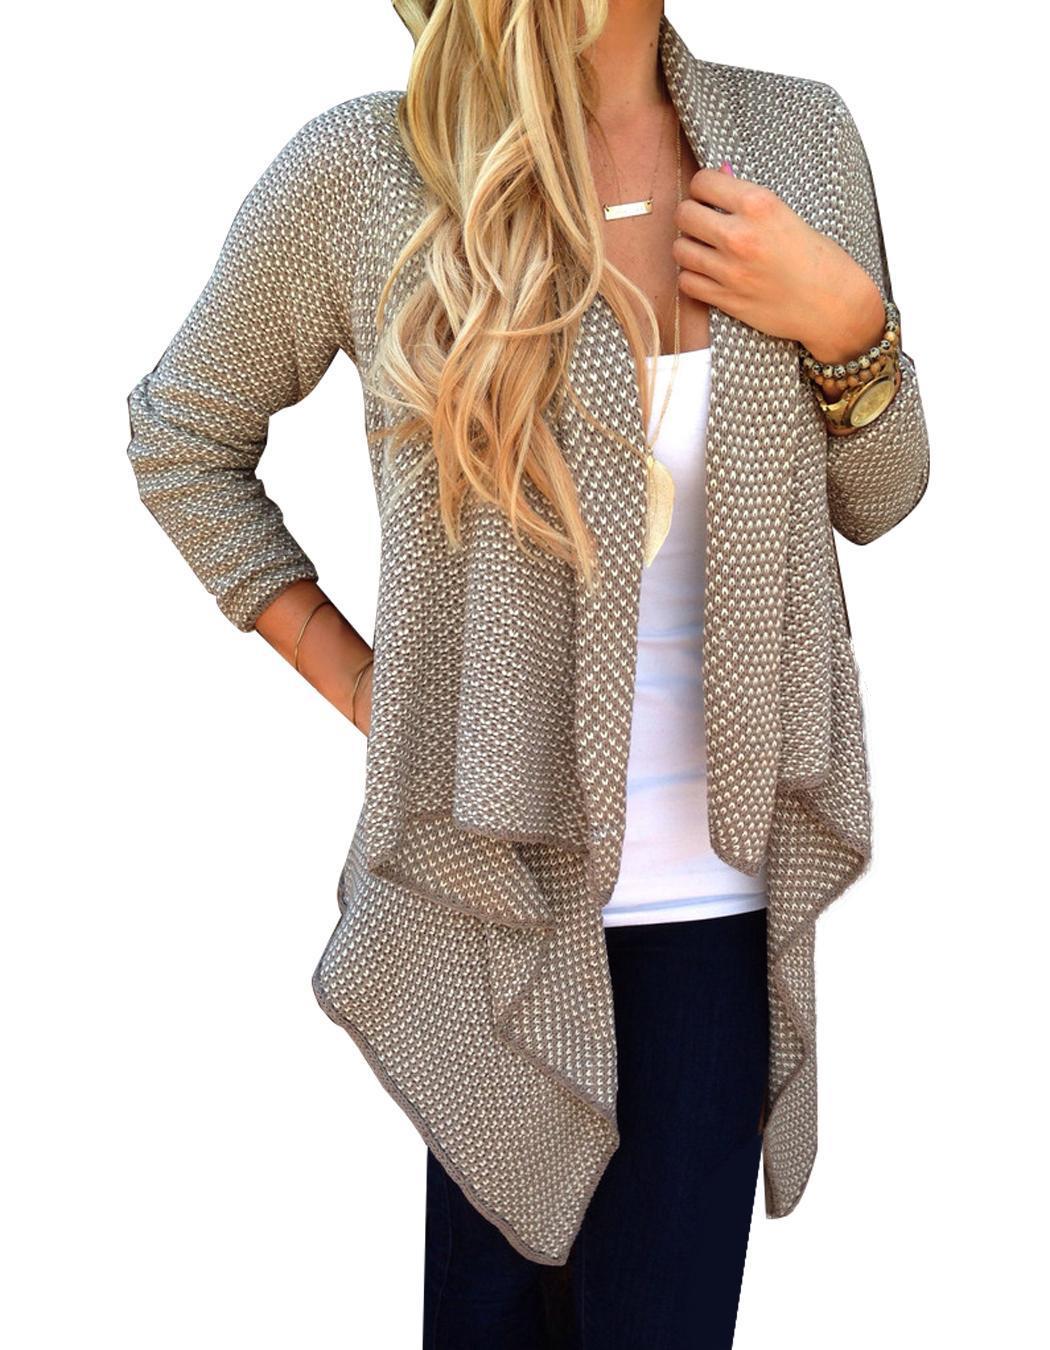 849f3a3fa Details about 2015 Stylish Ladies Women Loose Casual Knit Cardigan Jacket  Irregular EN24H 04